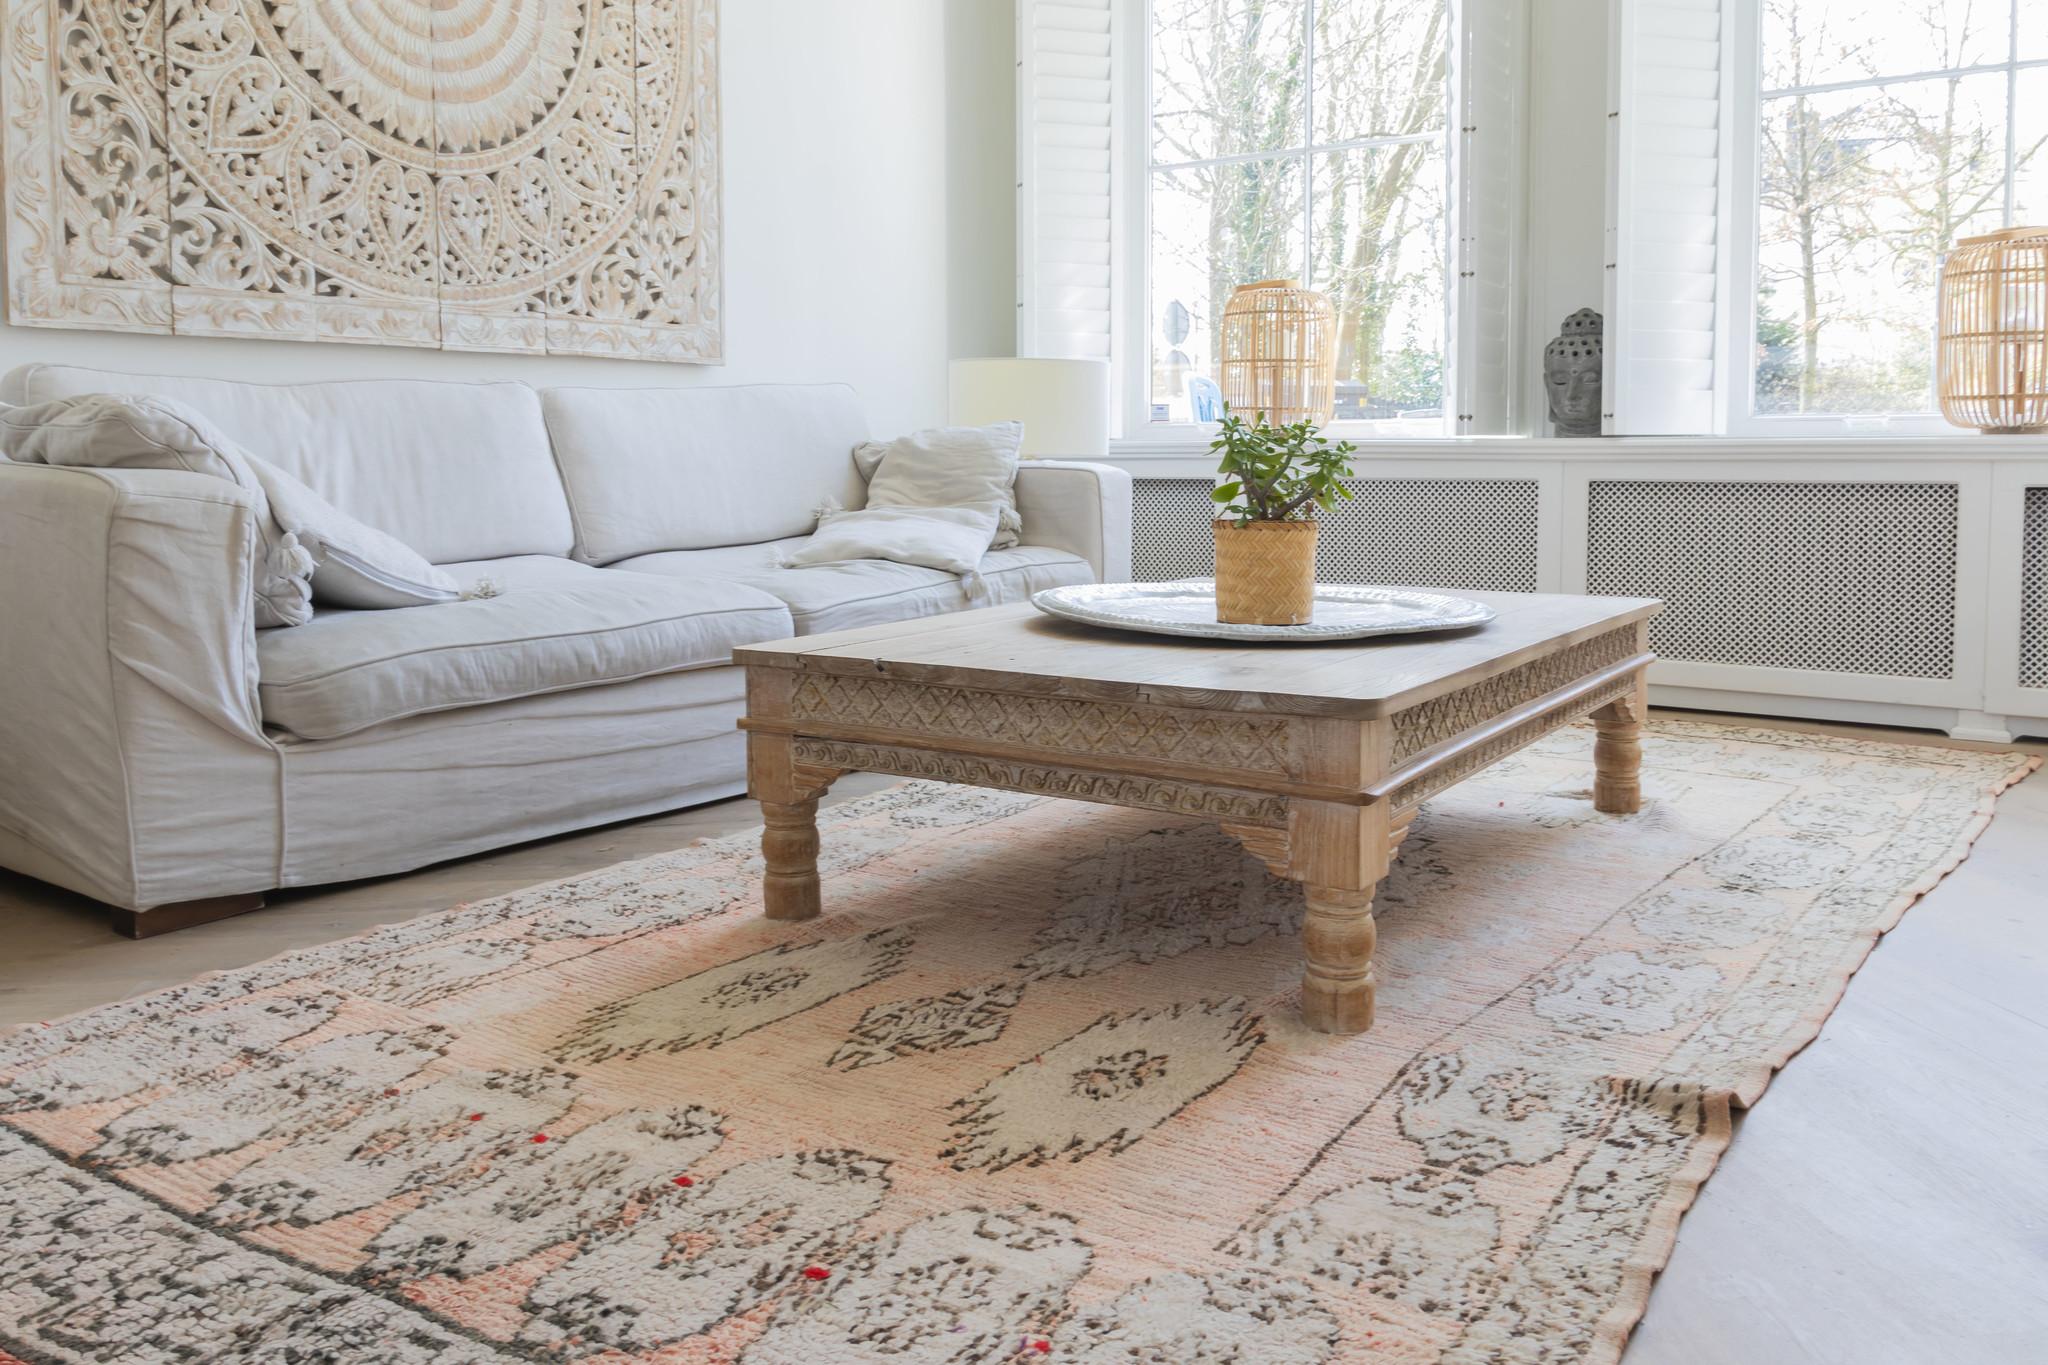 Simply Pure Handgefertigter Vintage Boujaad Teppich aus Marokko 180 x 367 cm